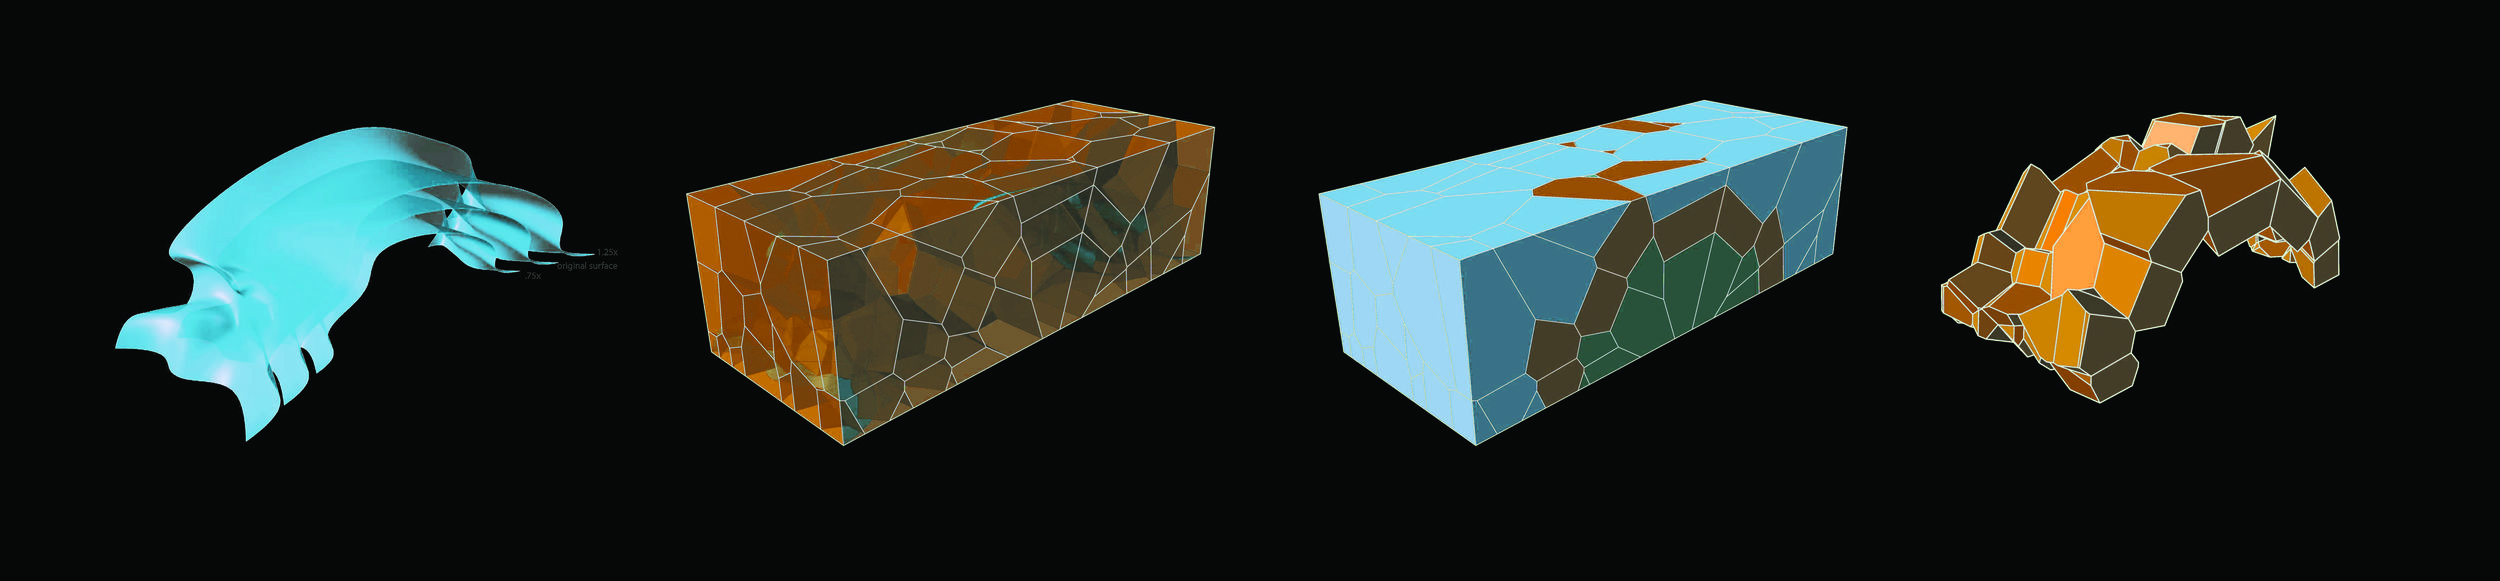 02.Voronoi_Process_2.jpg